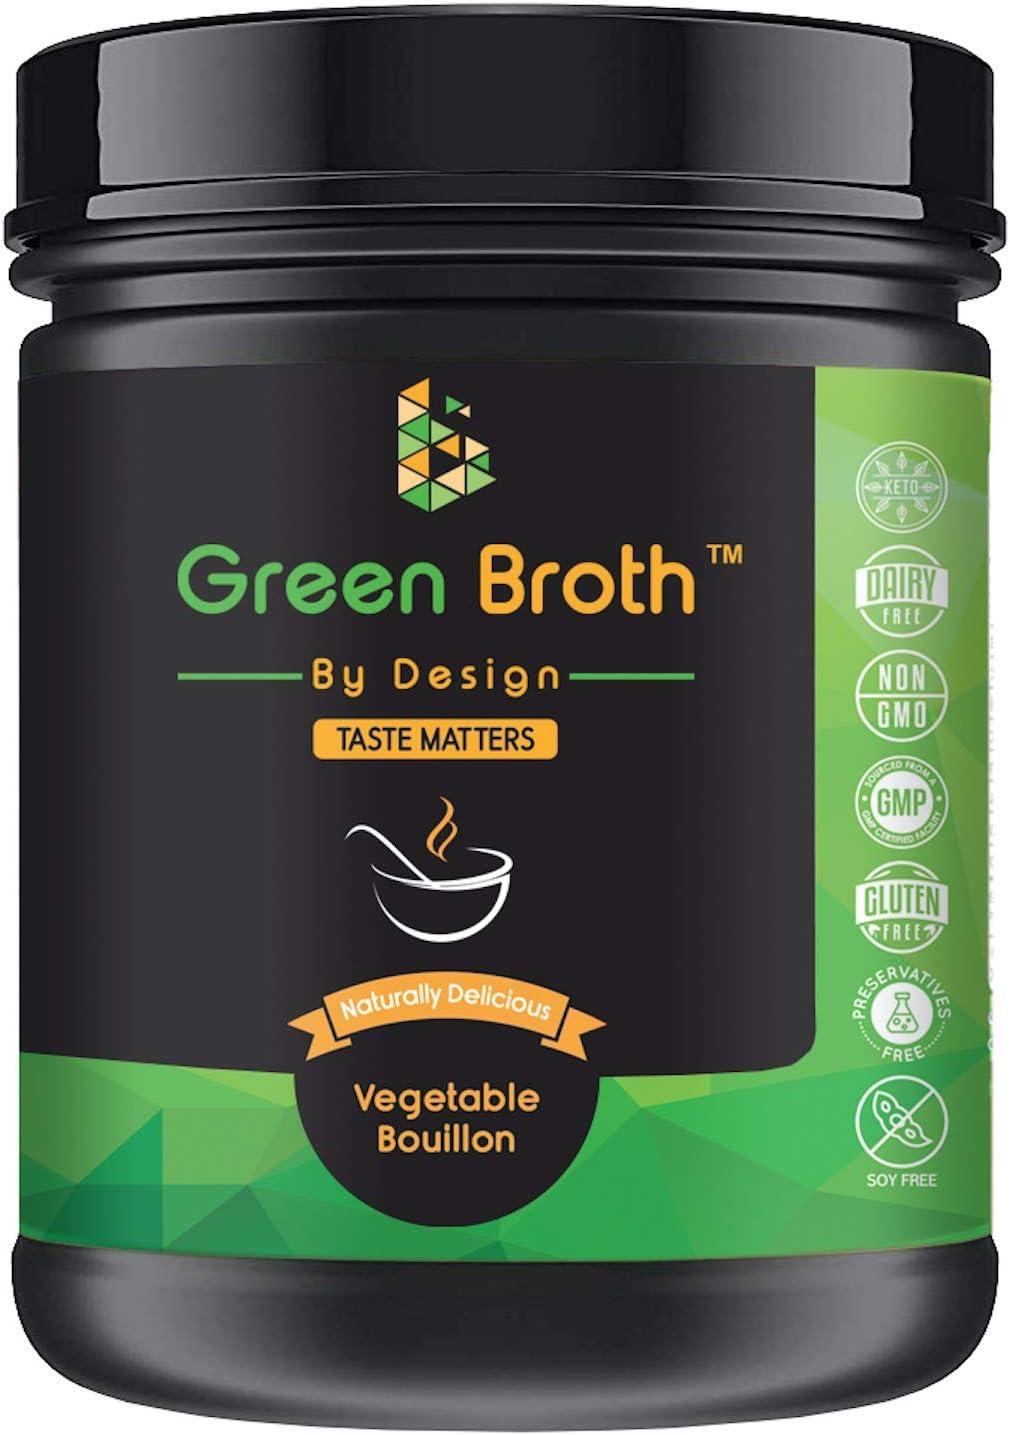 Organic Pea Protein • Vegetable Bouillon Natural Flavor • Keto • Non-GMO • 21 Portions • Protein/340g Jar • Broth by Design